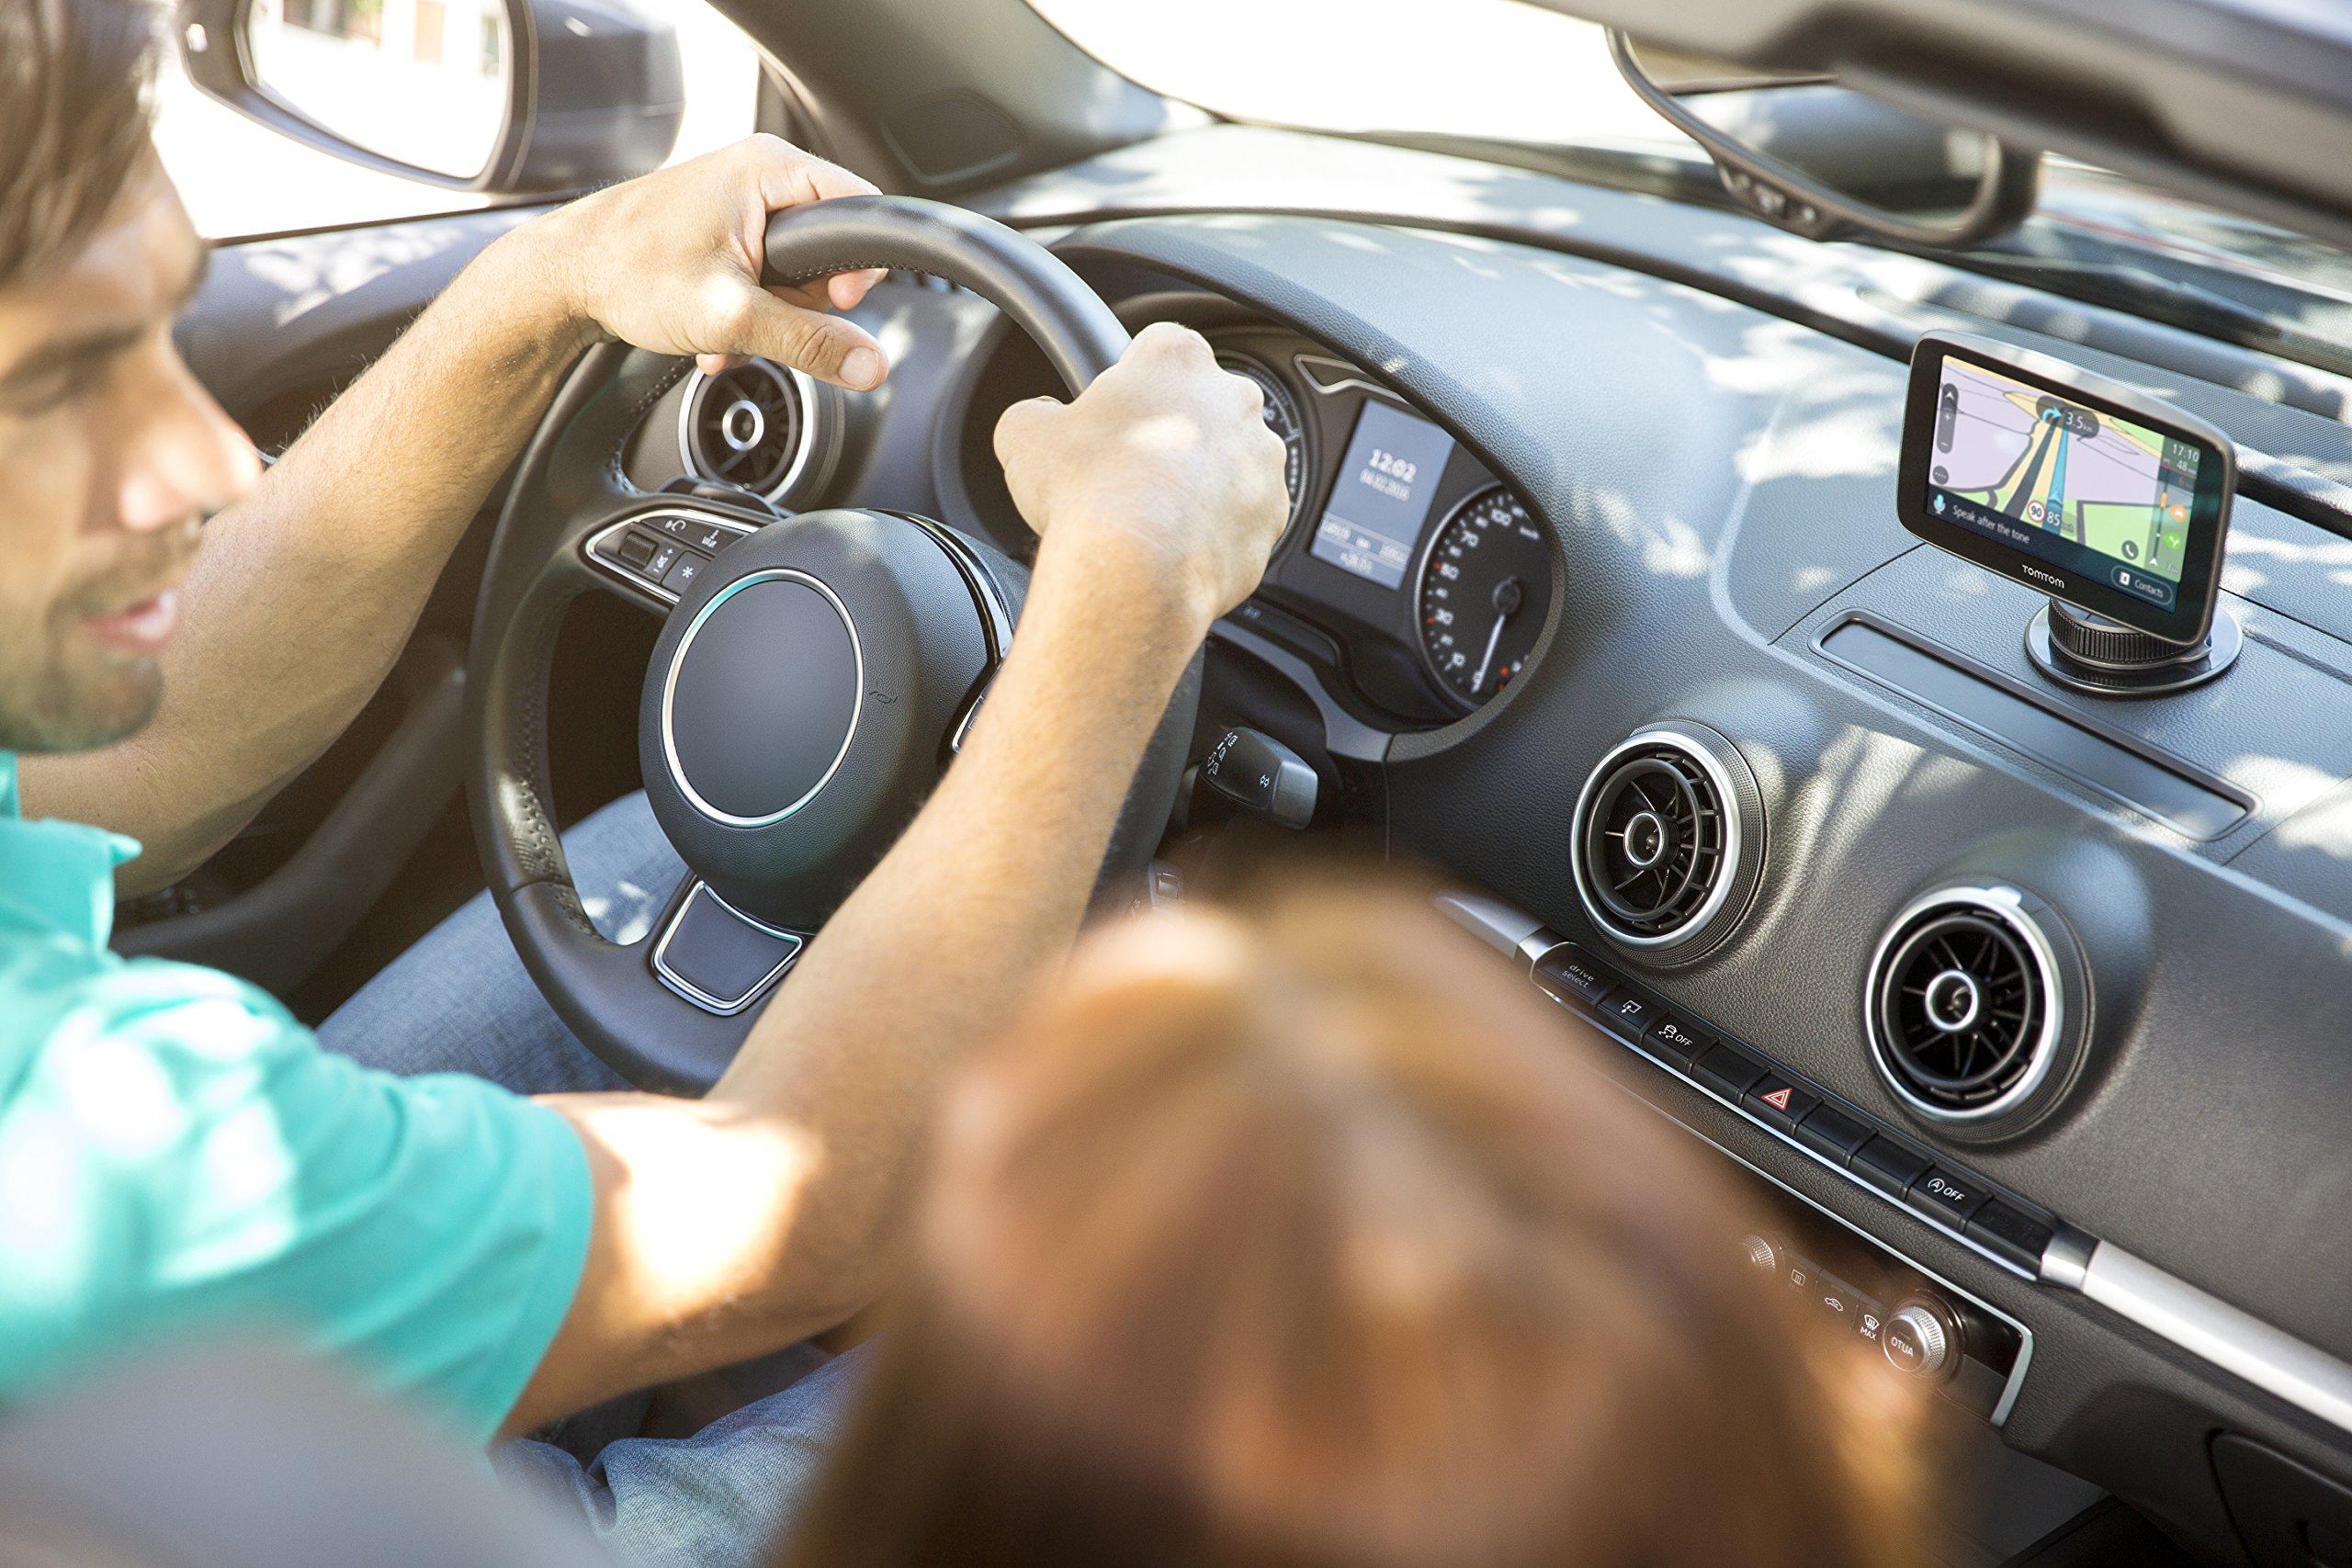 TomTom-Via-53-EU-Traffic-Navigationsgert-13cm-5-Zoll-Updates-ber-Wi-Fi-Smartphone-Benachrichtigungen-Lebenslang-Karten-Updates-Europa-Lebenslang-TomTom-Traffic